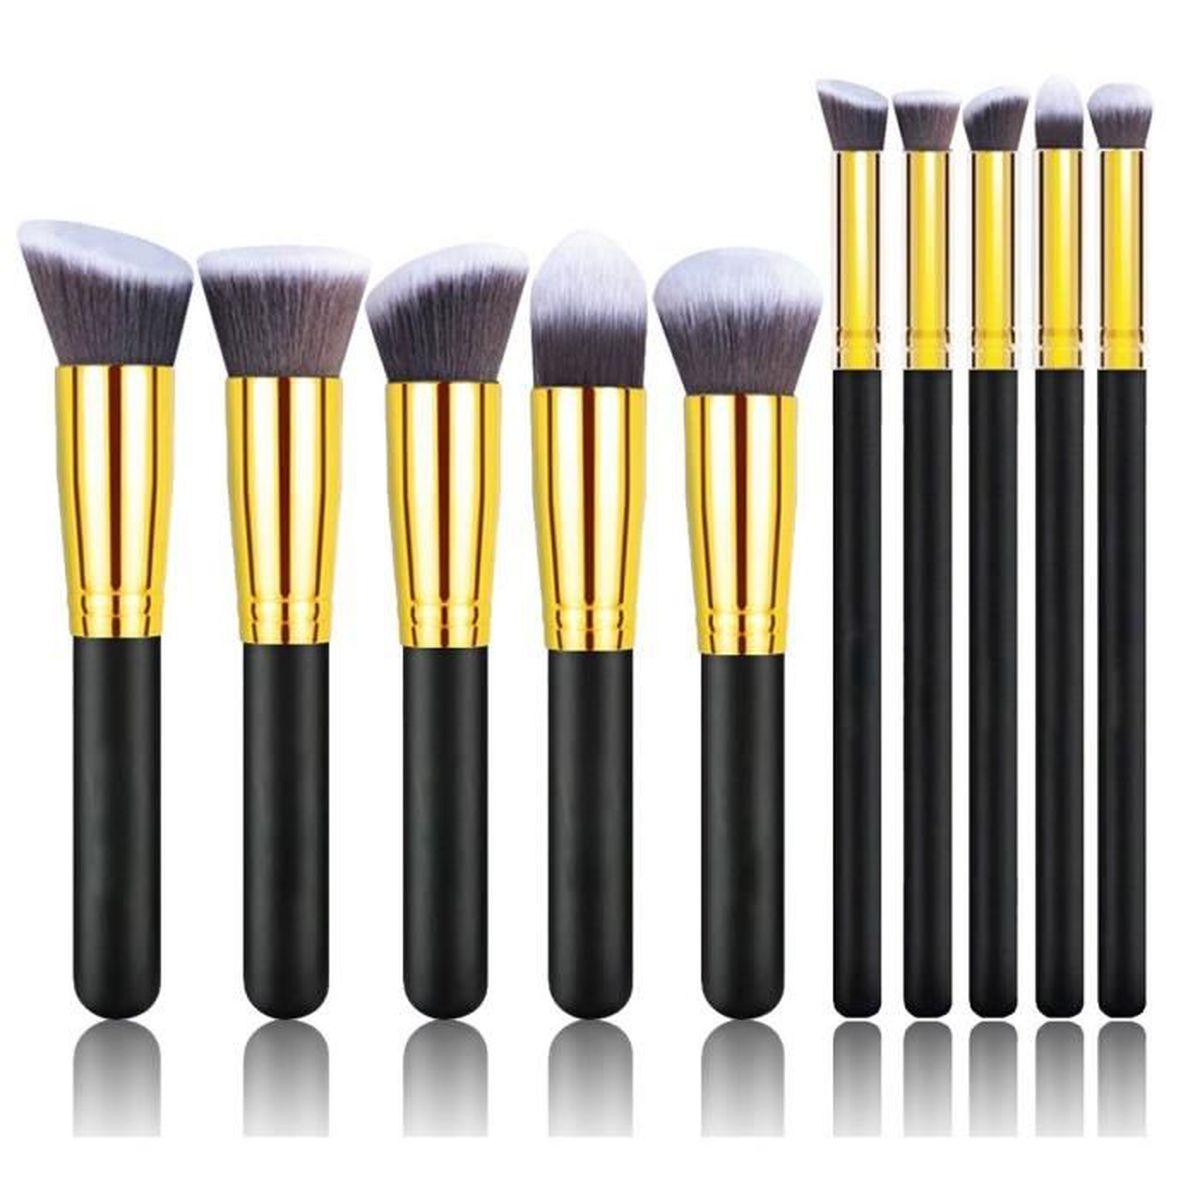 Style 10pcs Professional Kabuki Makeup